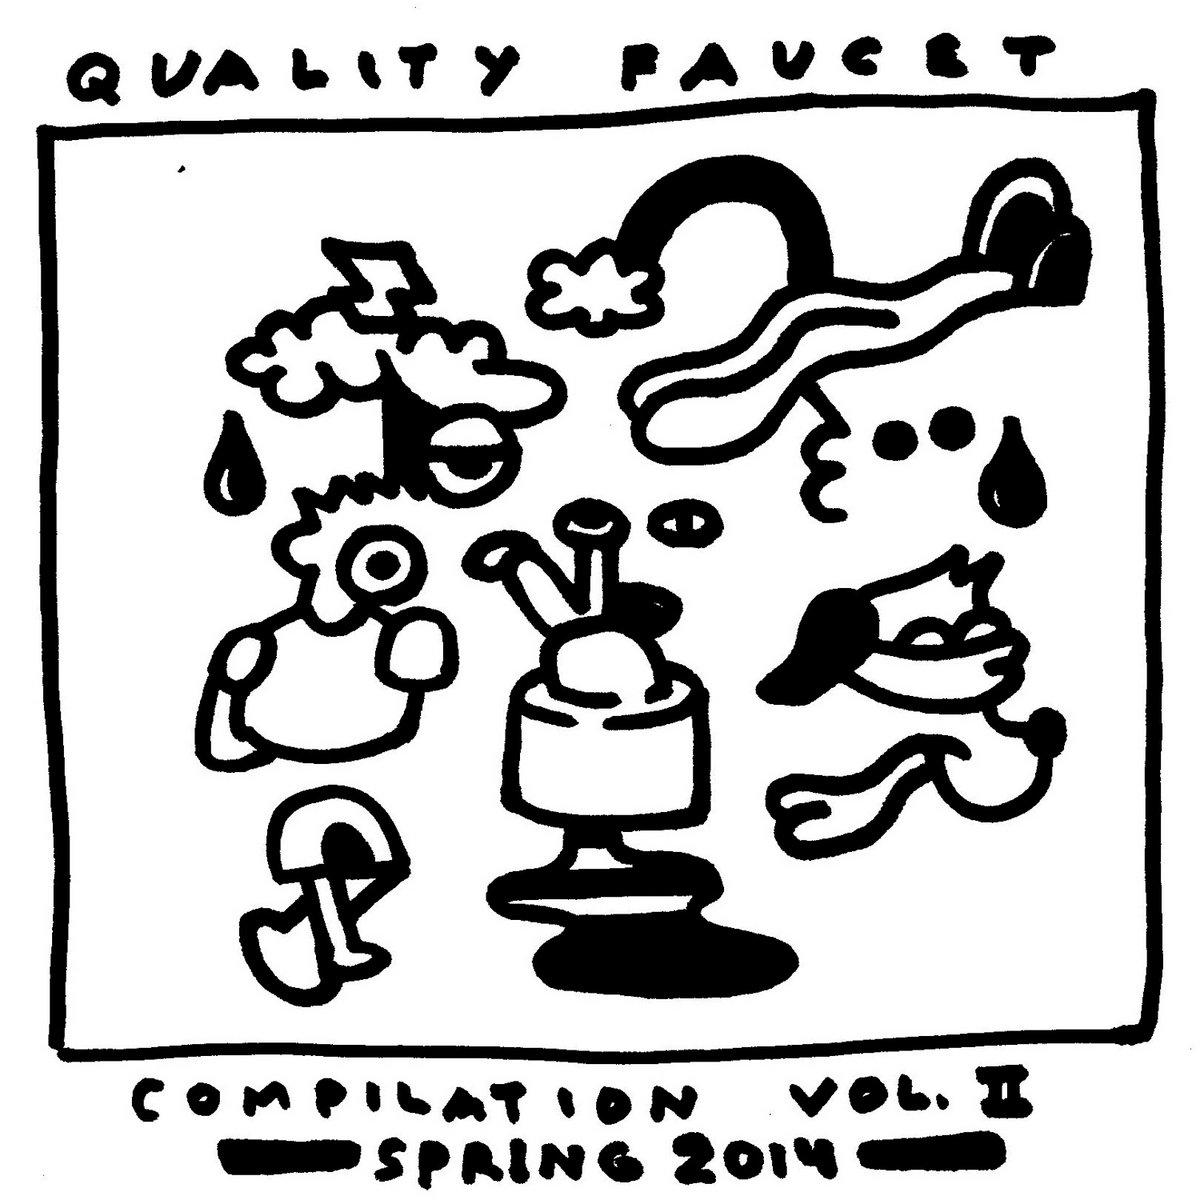 Quality Faucet Records - Compilation Vol. 2 | Quality Faucet Records